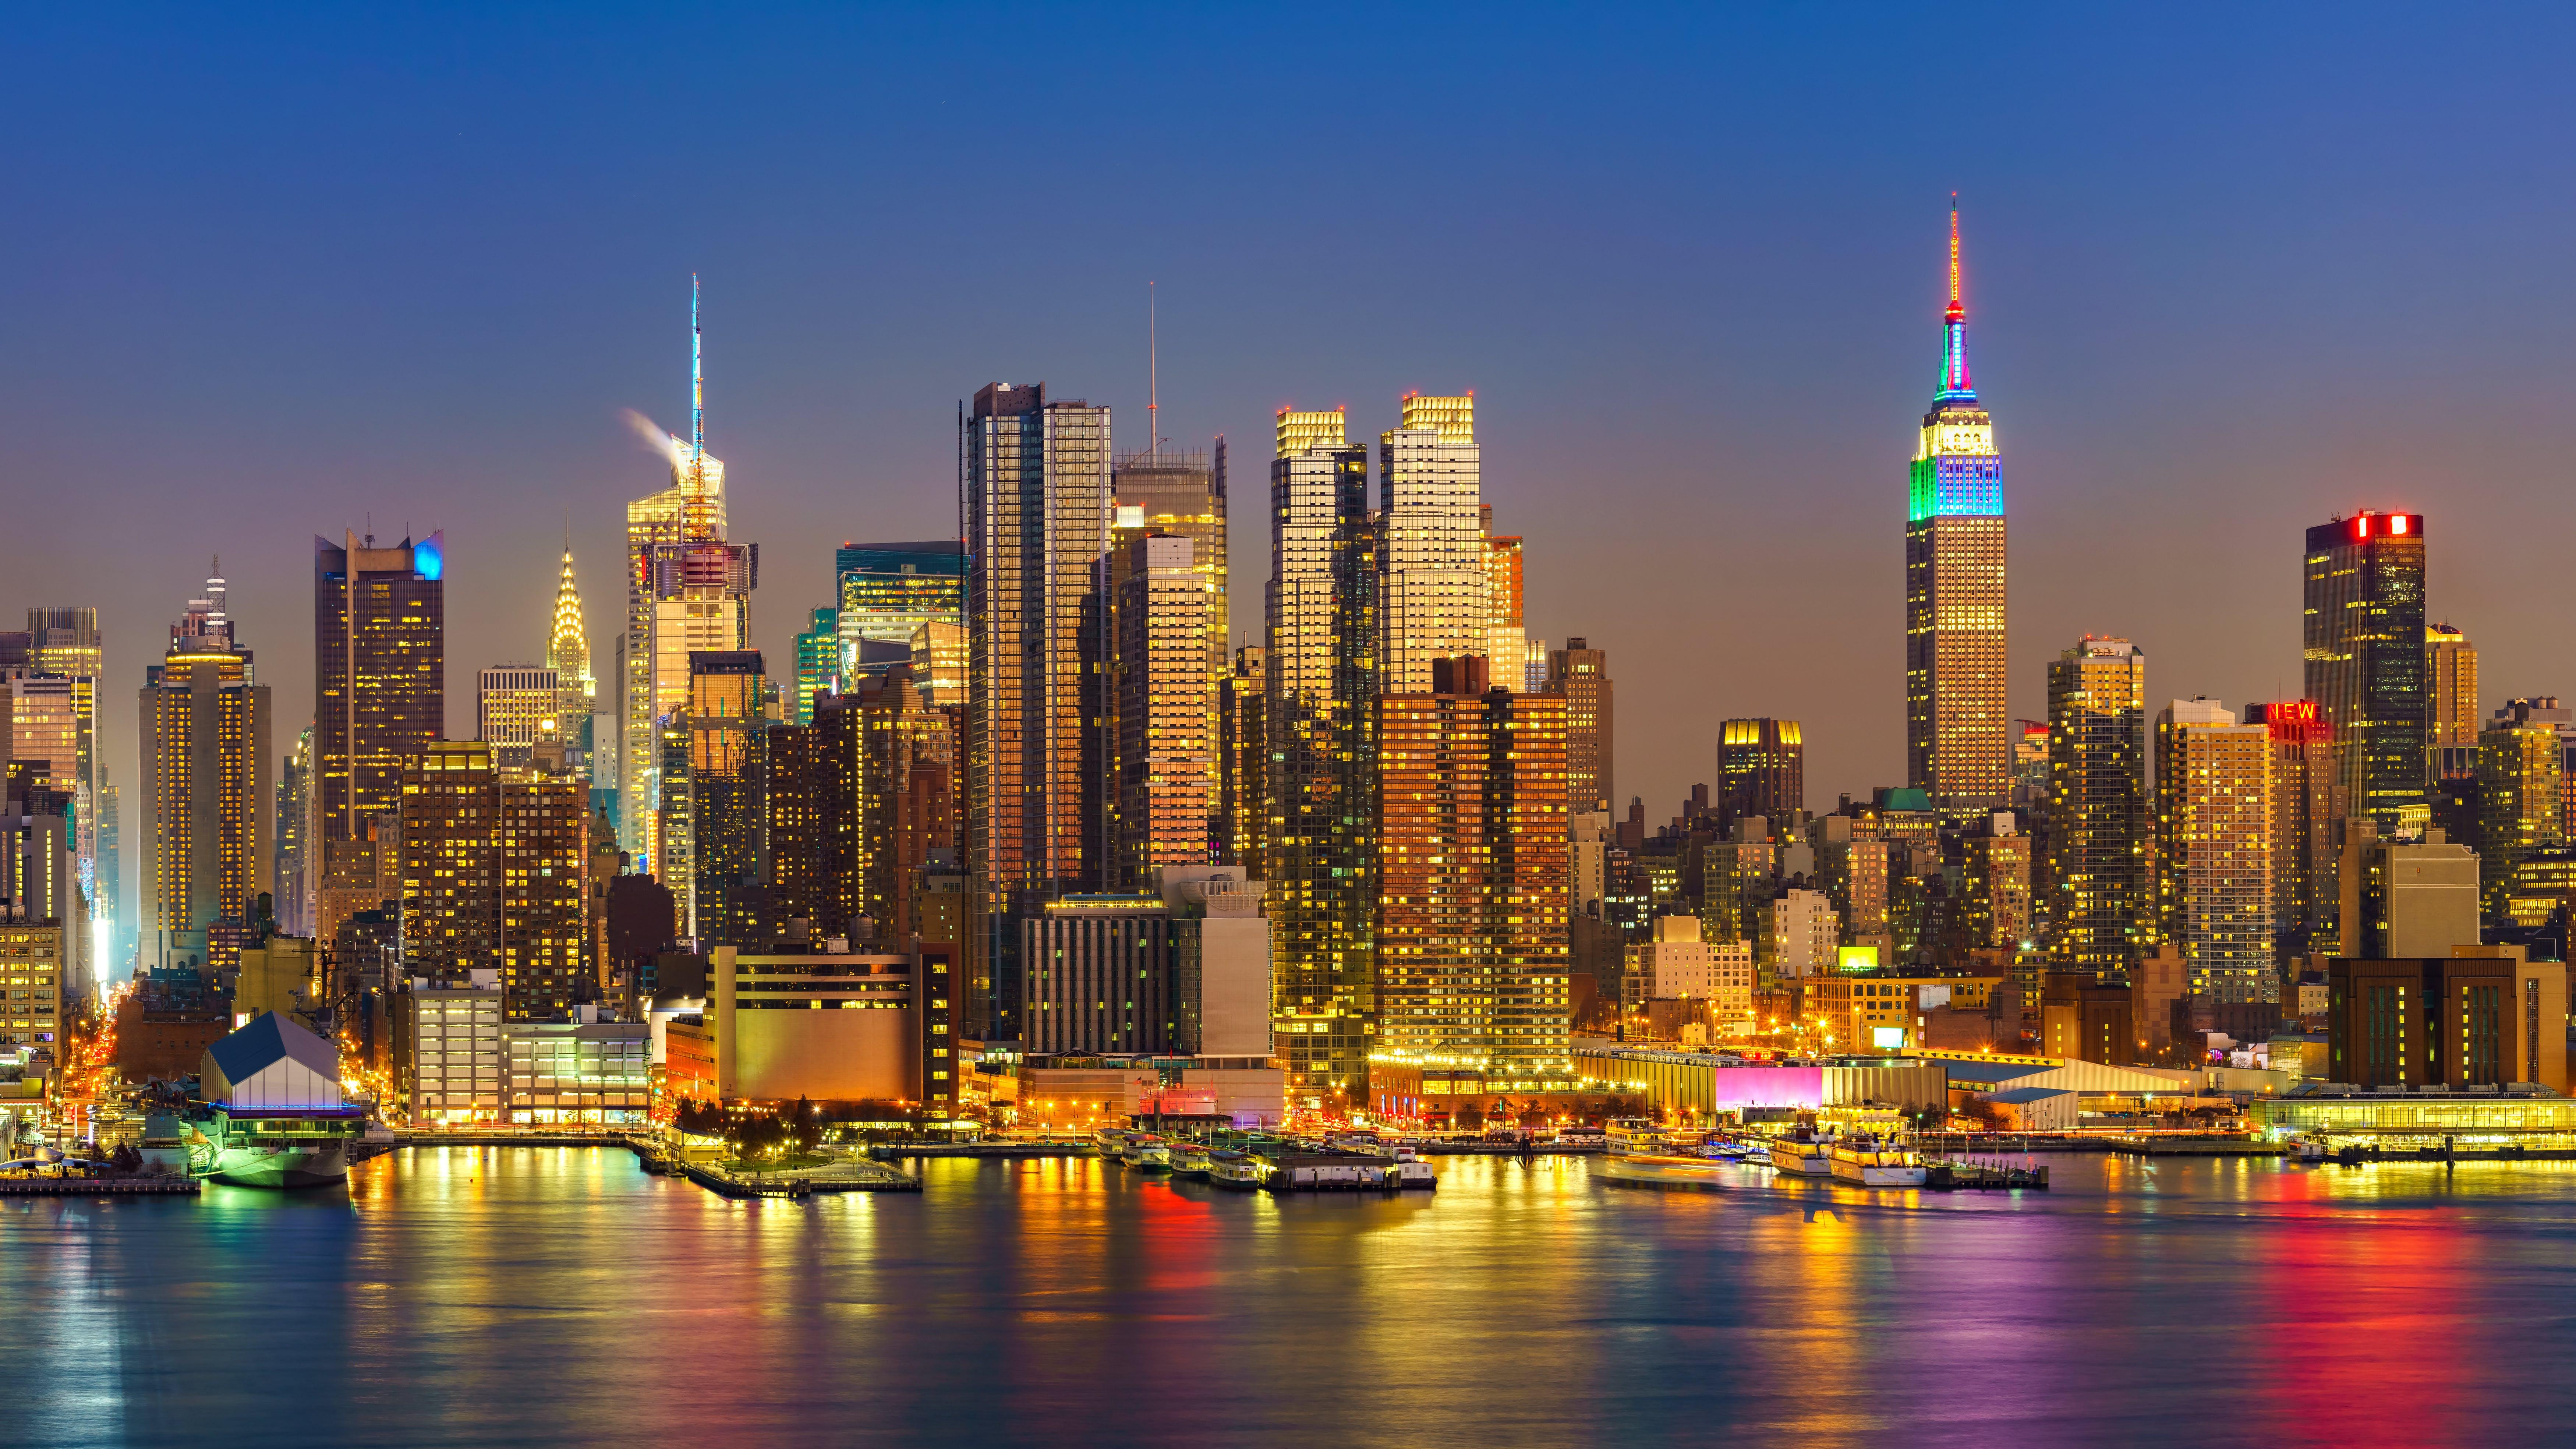 Big Apple in lights - NYC night tour